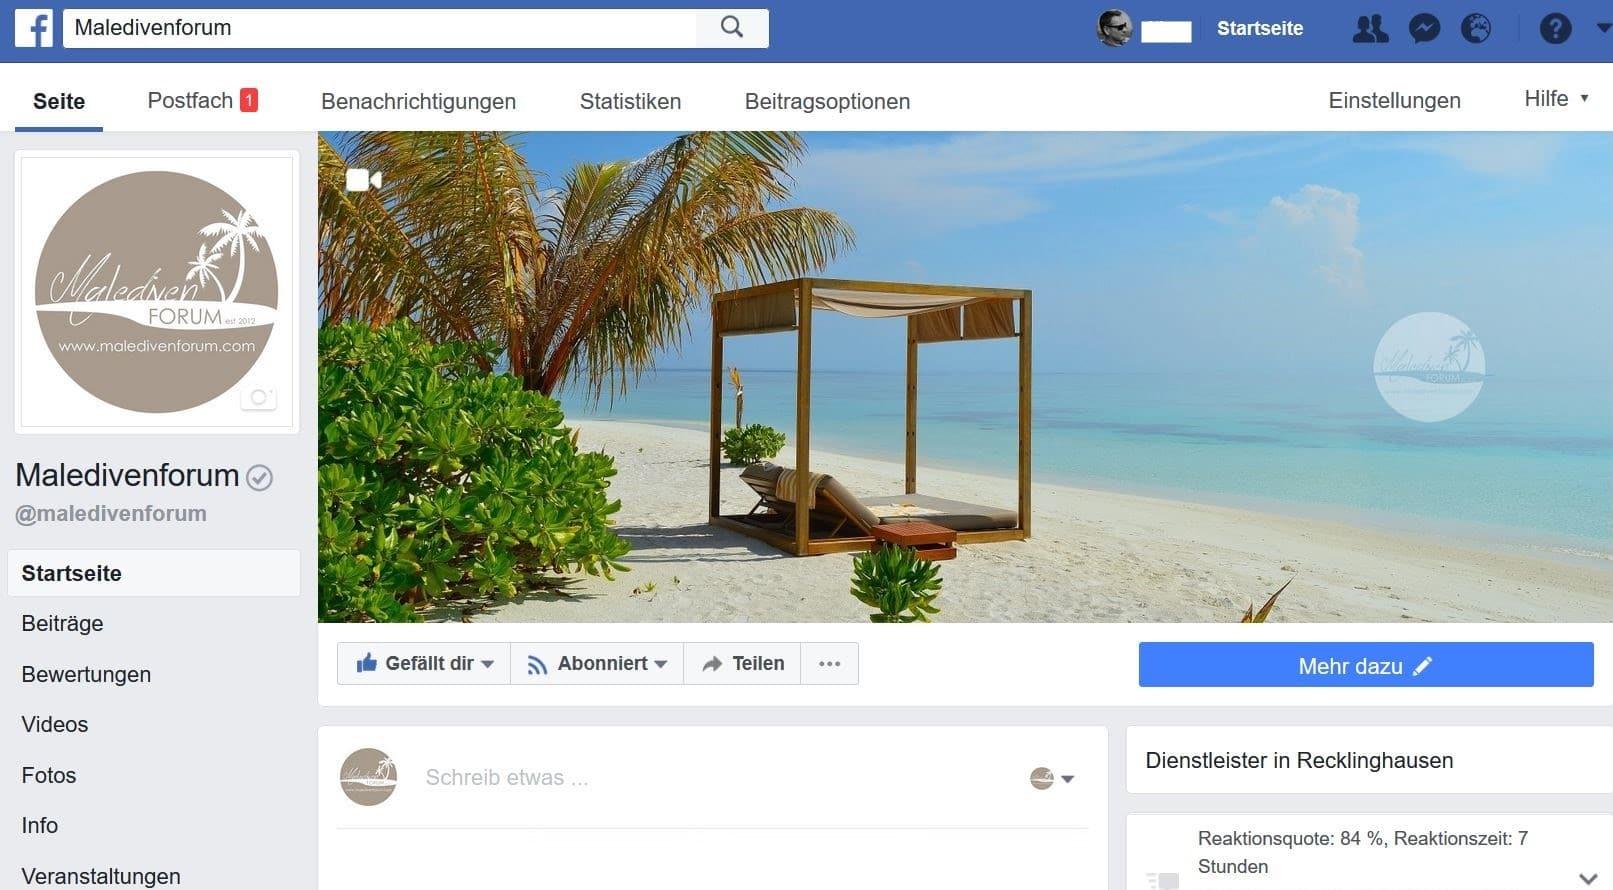 Maledivenforum Facebook-Seite